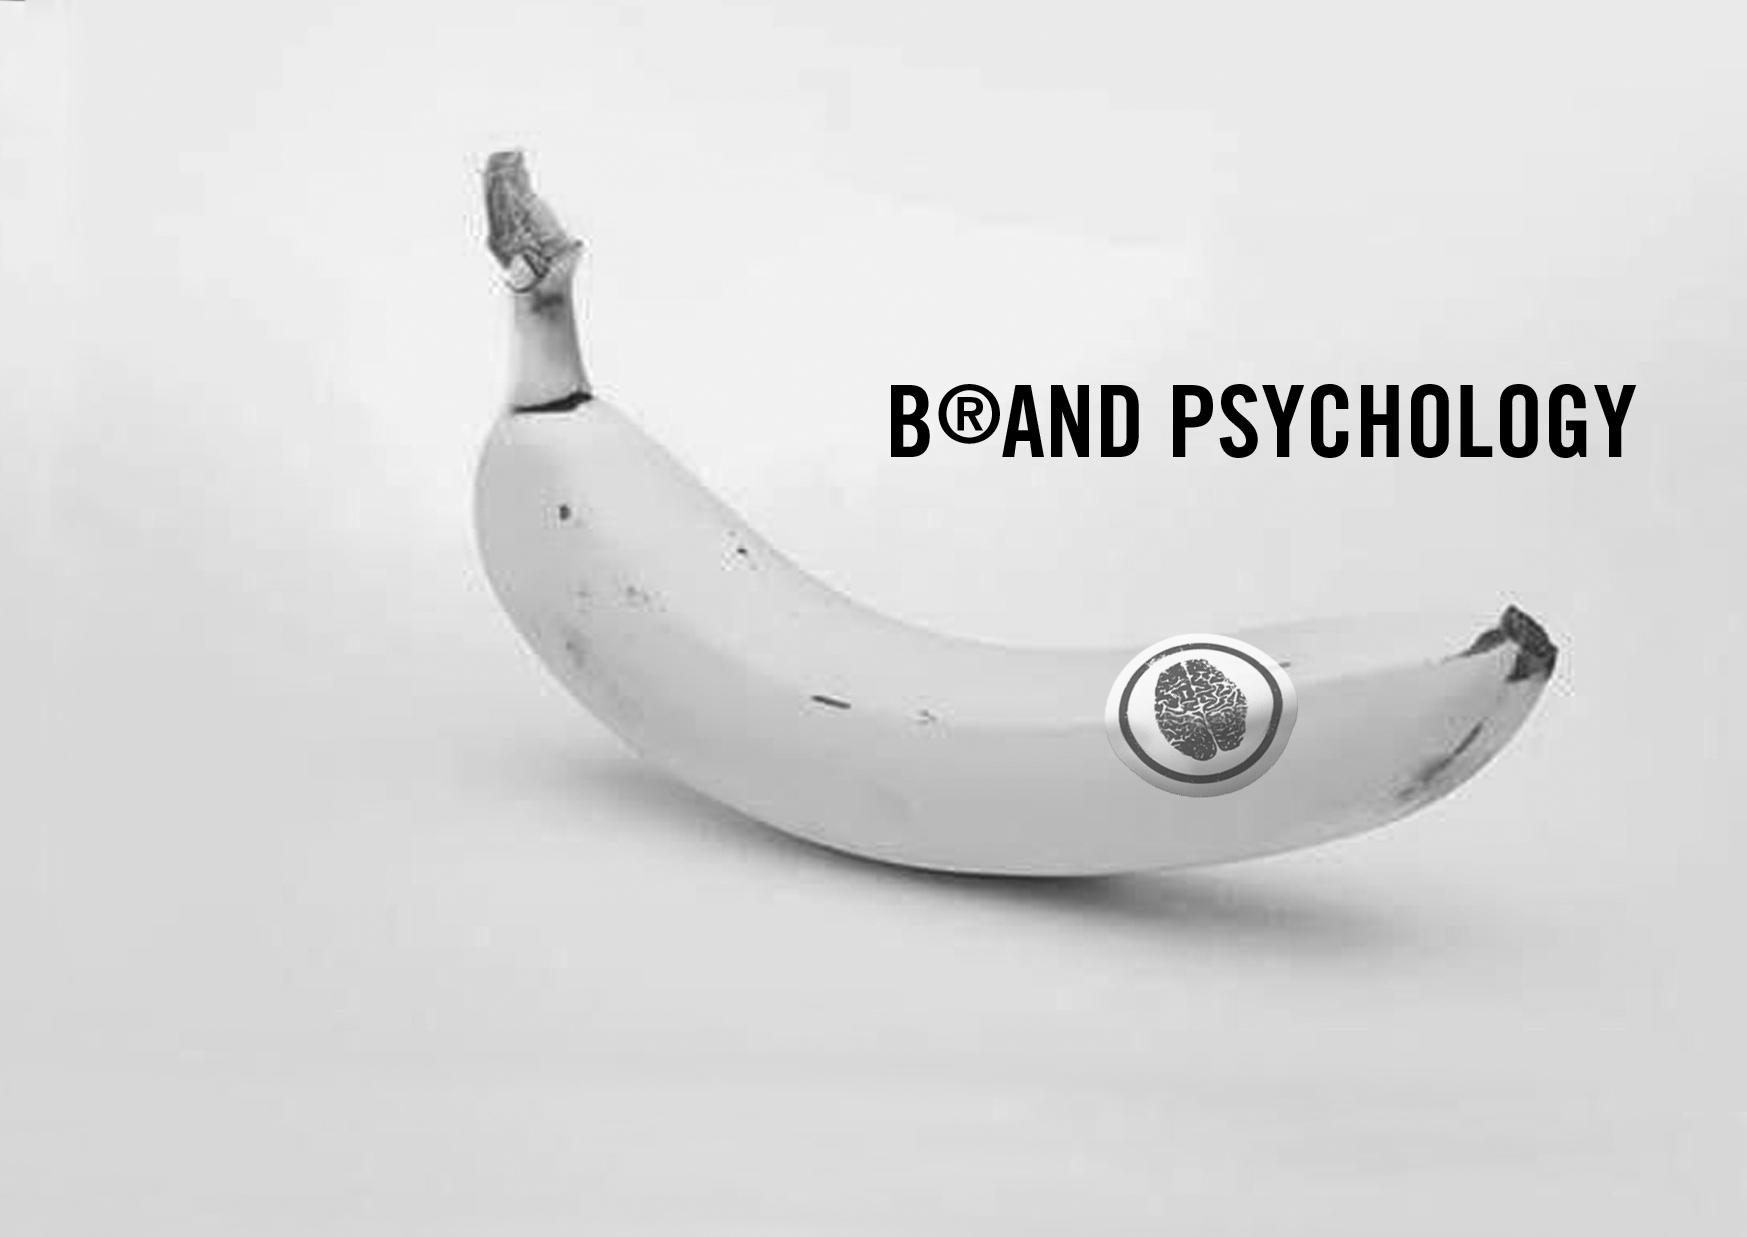 banana brand psychology.jpg